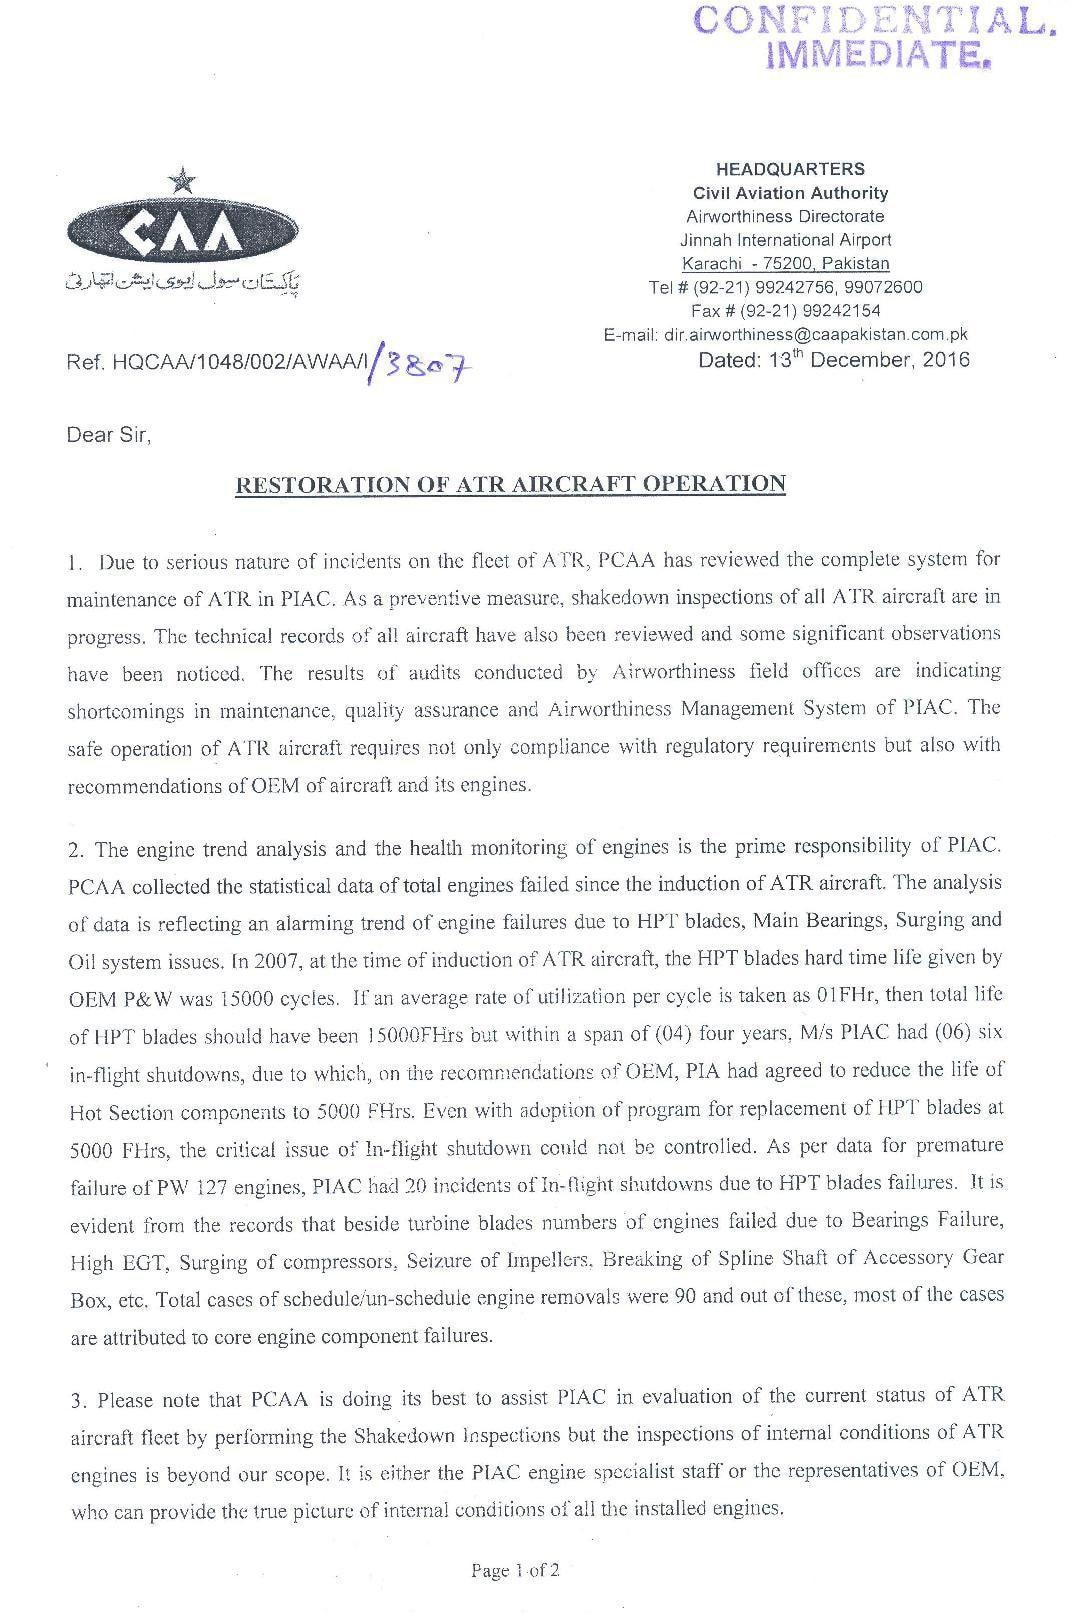 CAA letter